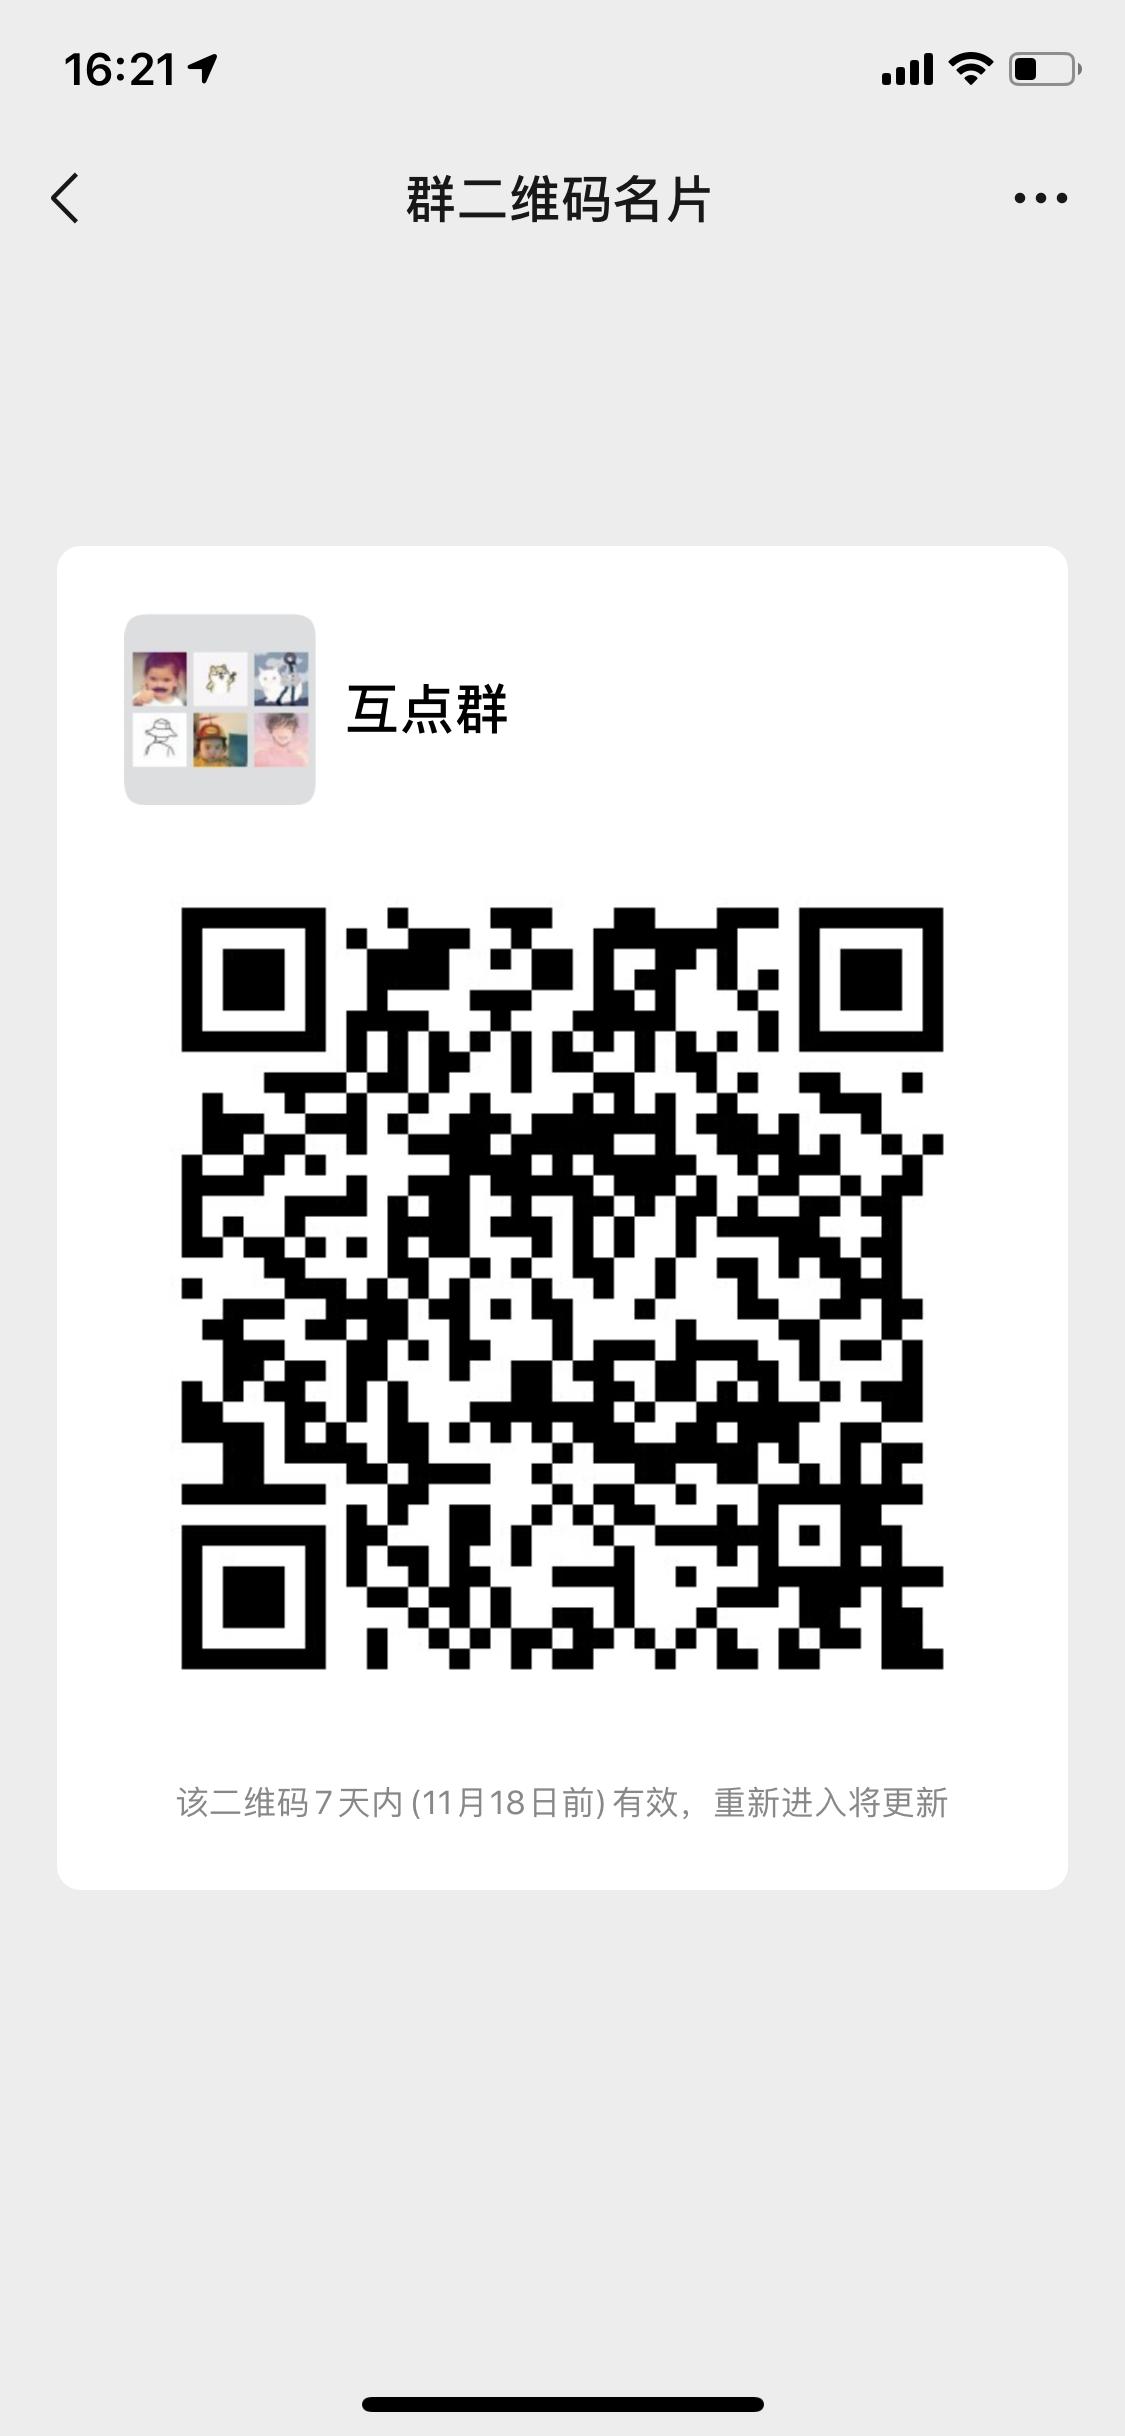 791573460483_.pic_hd.jpg